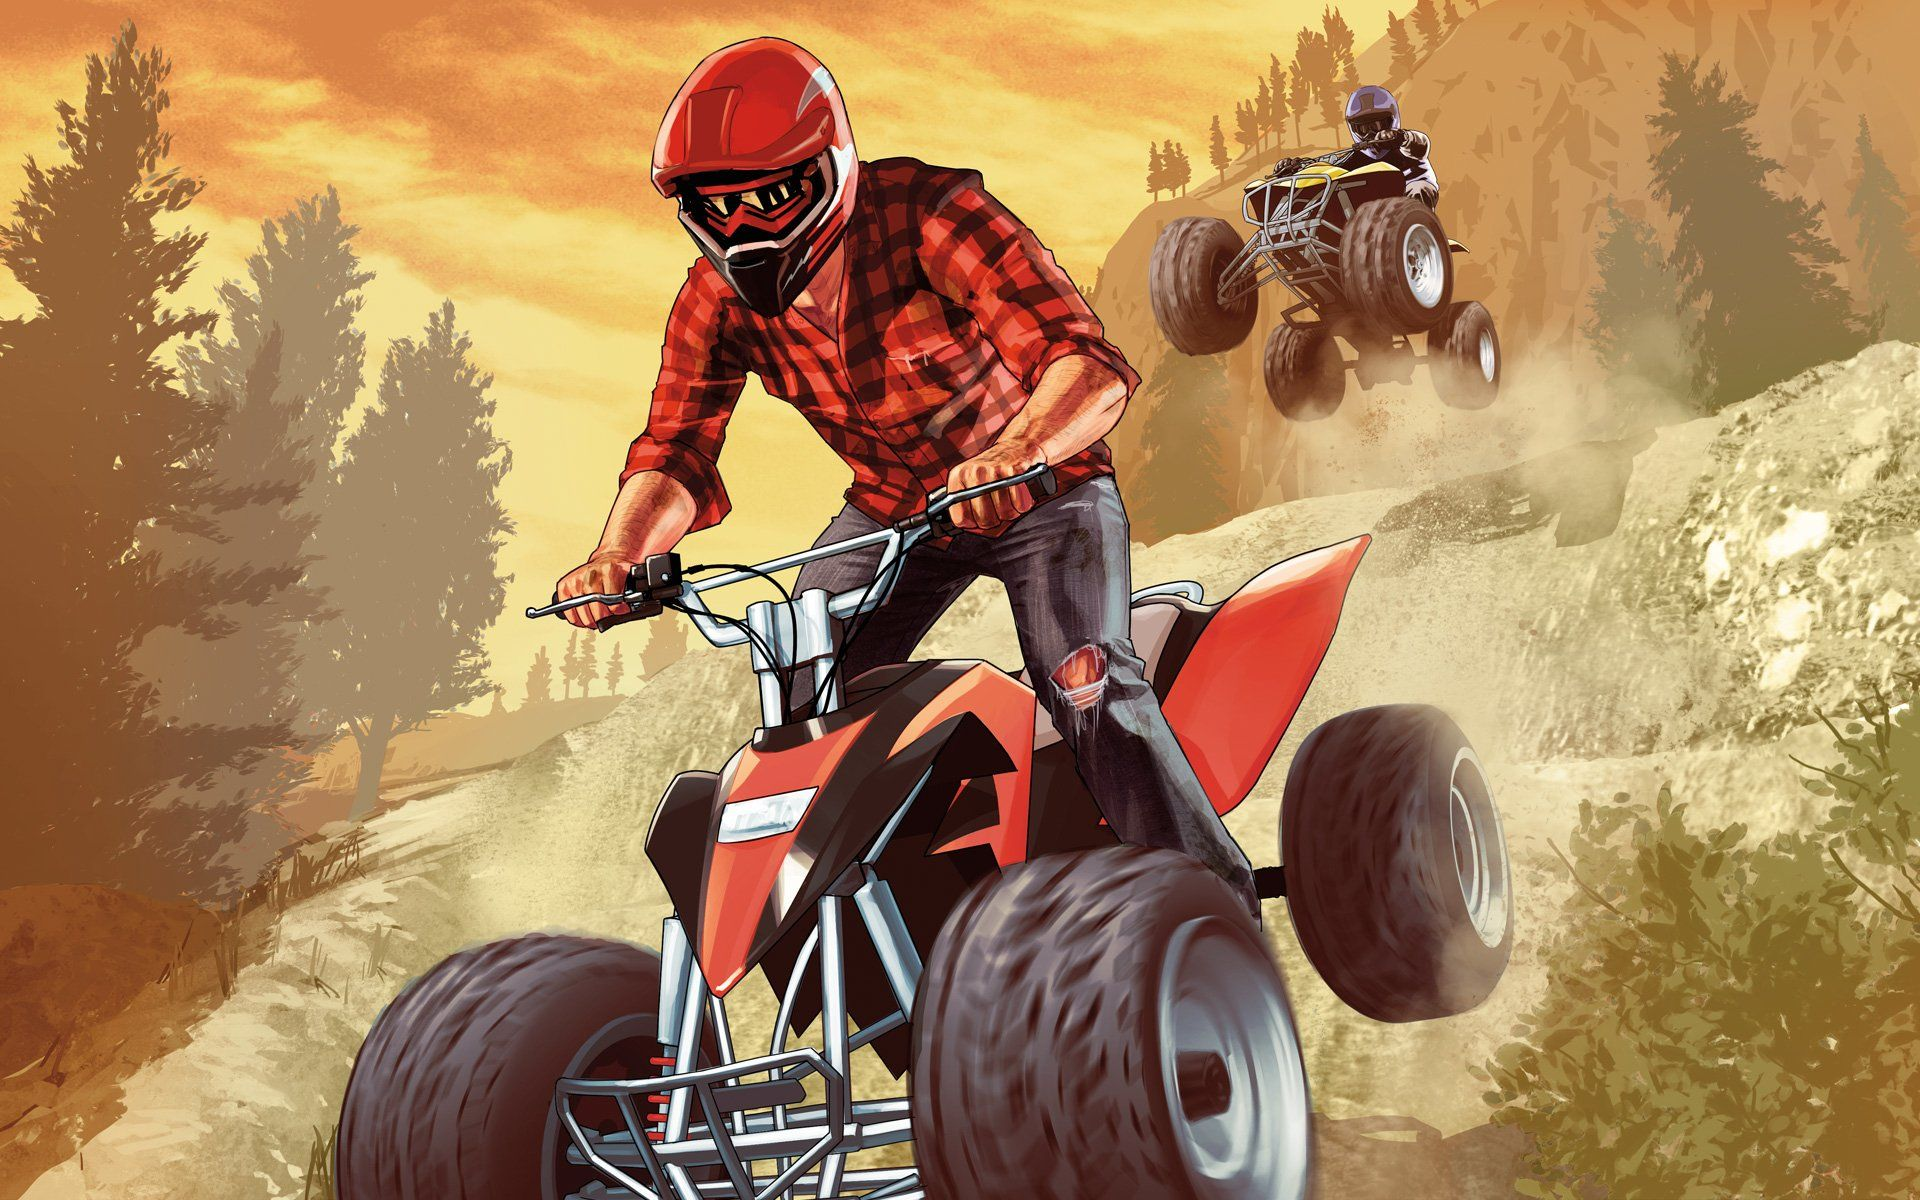 Video Game Grand Theft Auto V Wallpaper Grand theft auto